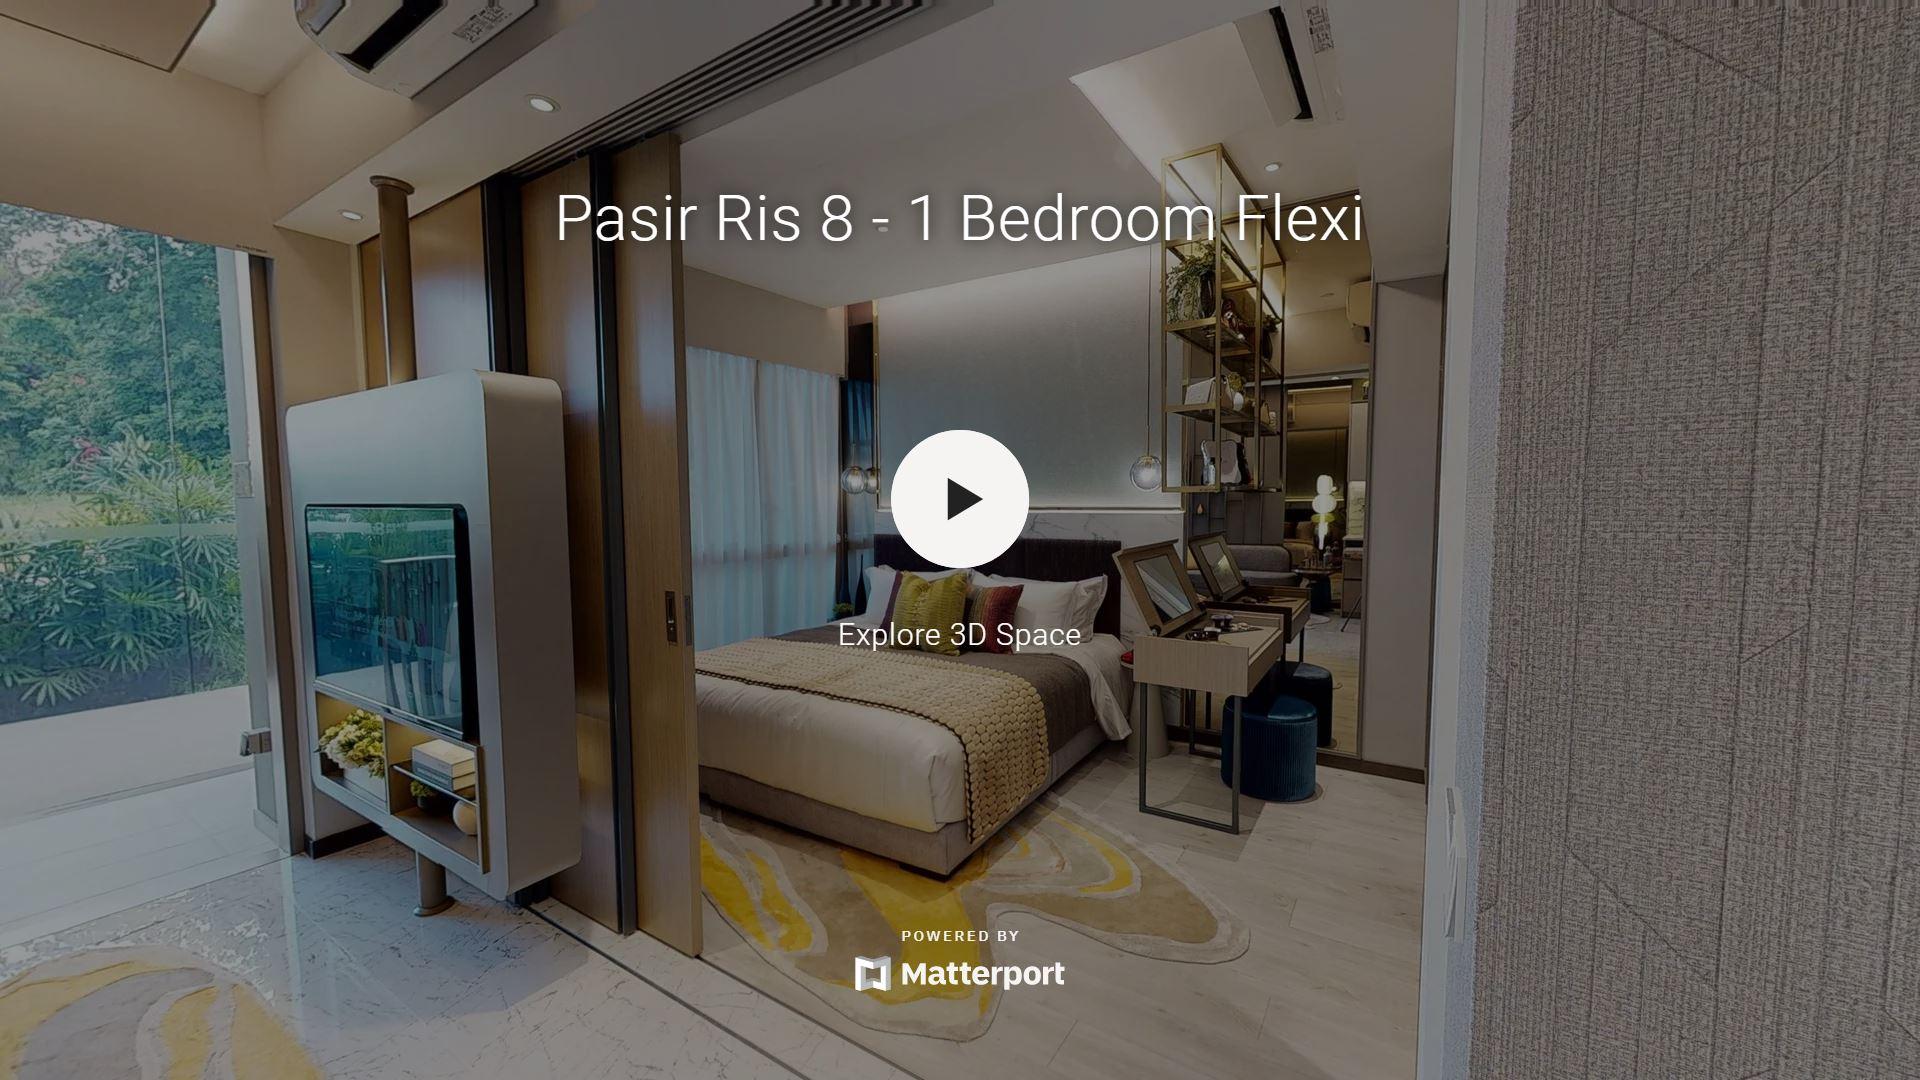 Pasir Ris 8 Showflat Virtual Link for 1 Bedroom Flexi Type AF1